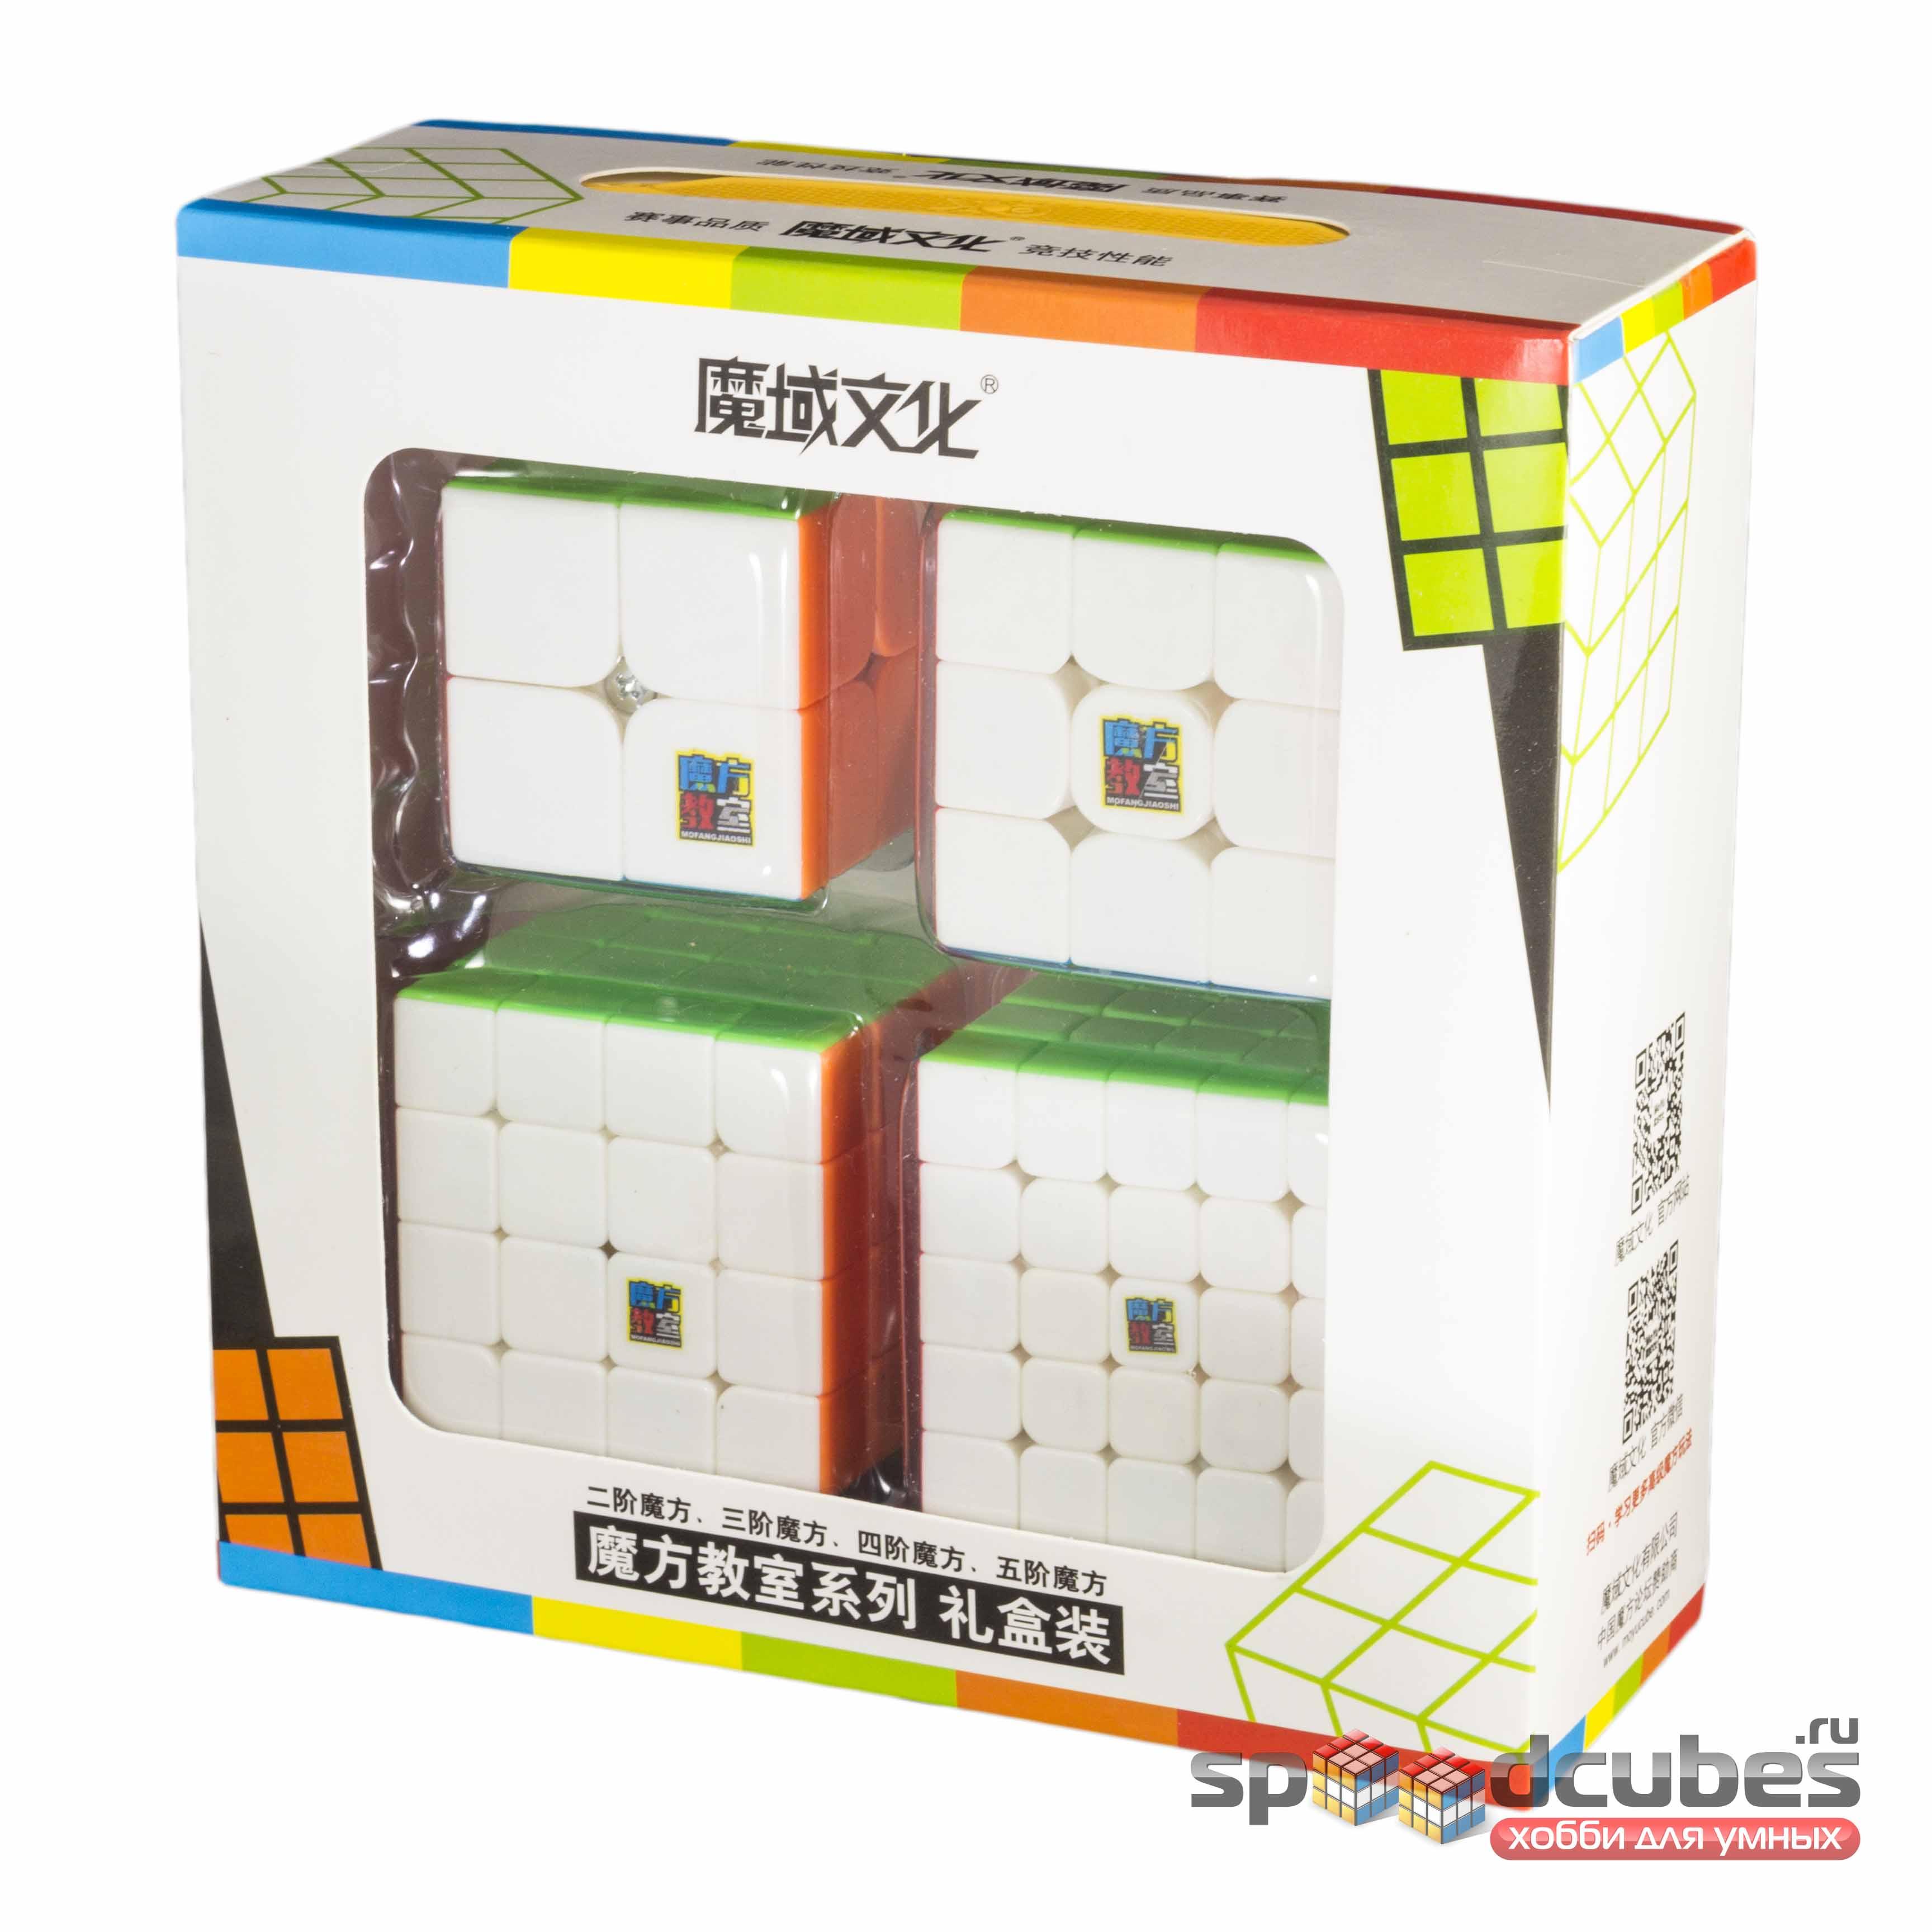 MoYu Cubing Classroom (набор Moyu MF2s, MF3rs, MF4s, MF5s) 1